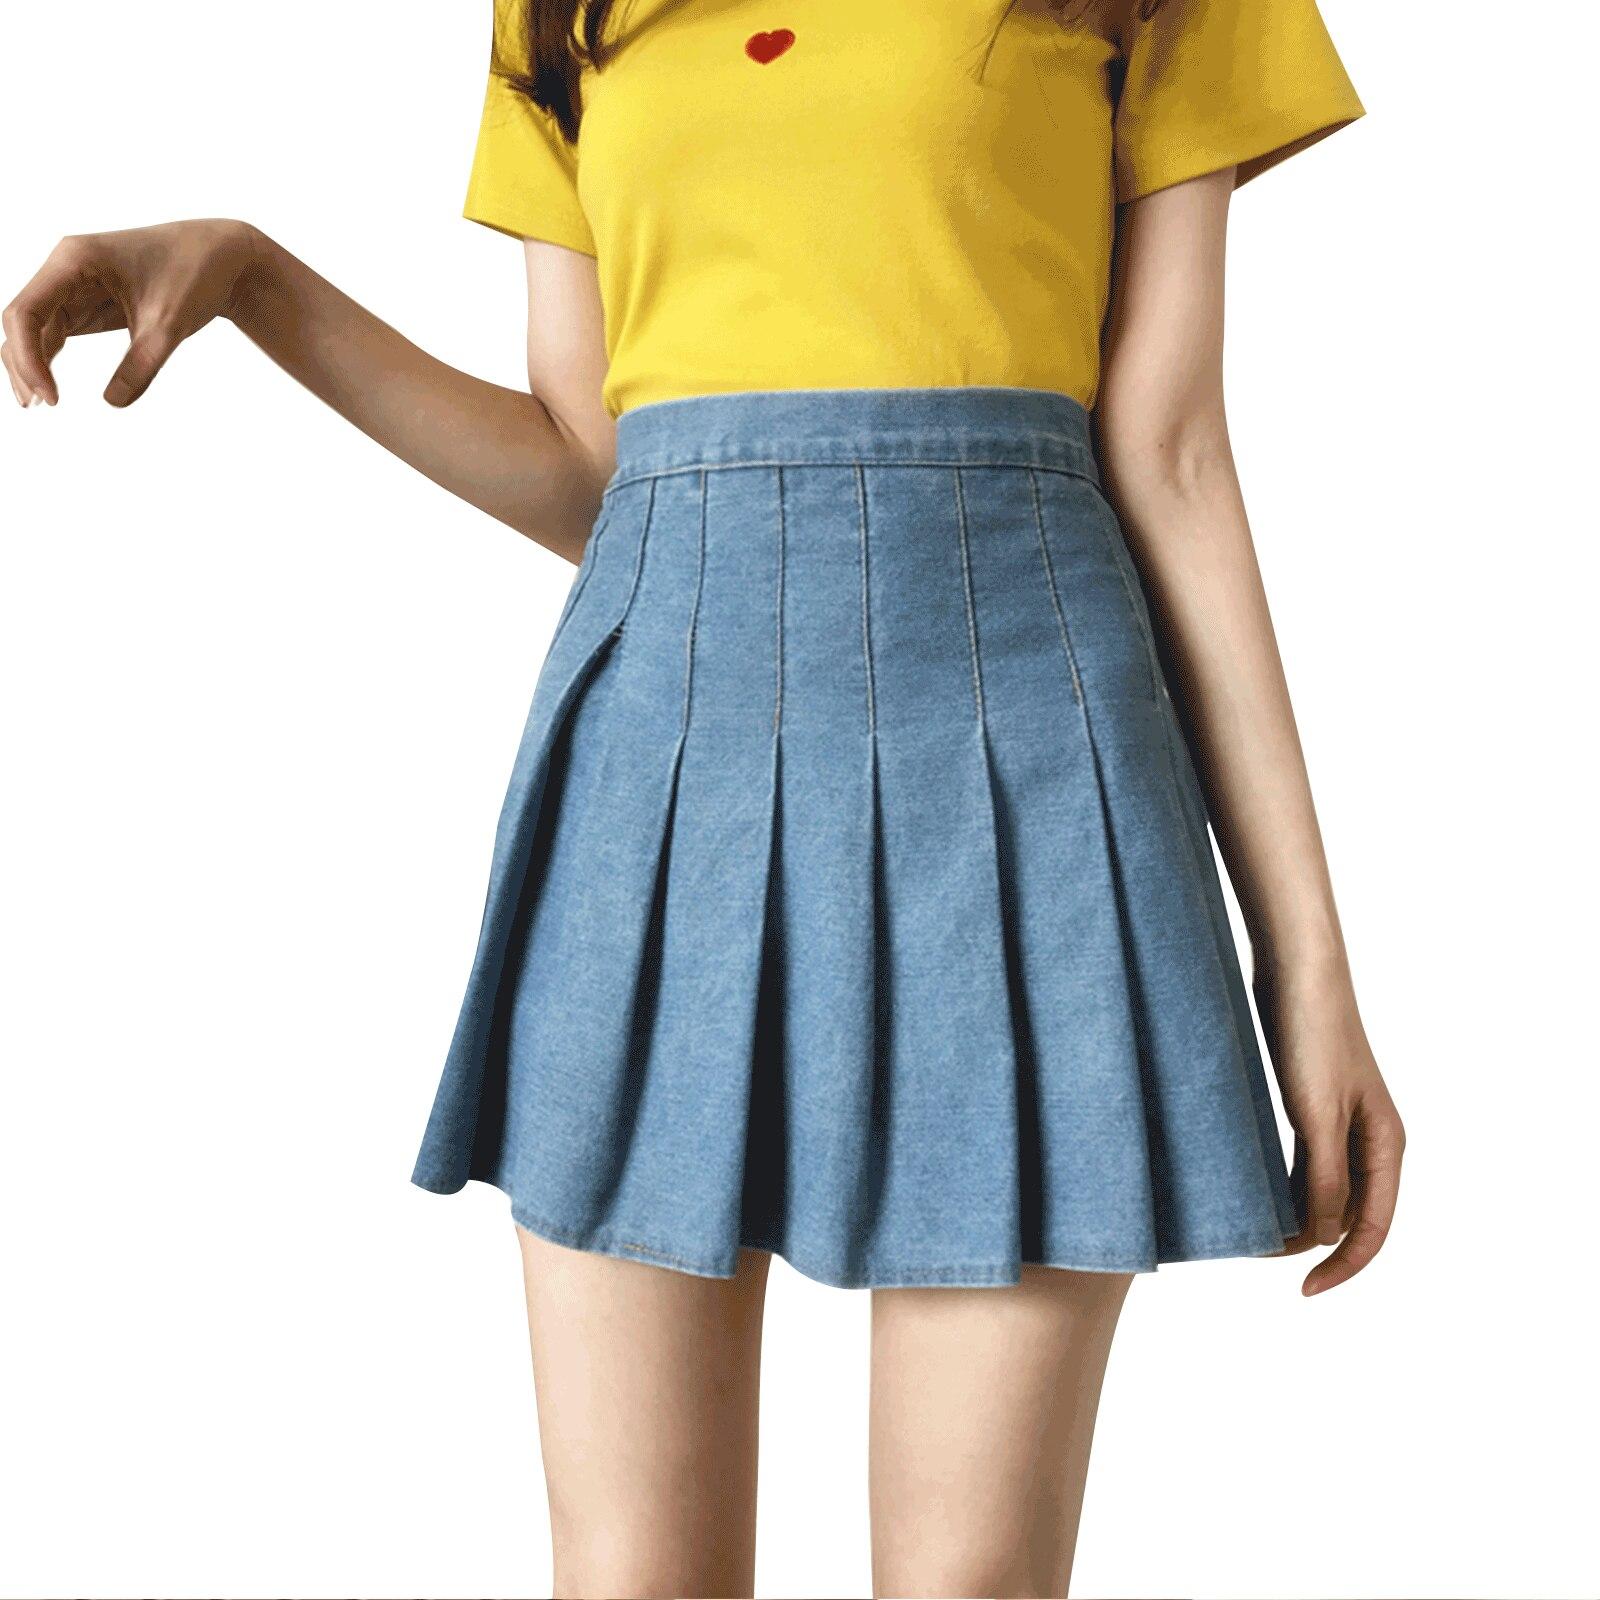 Women's Korean Denim Color Skirt Summer Fashion High-waist A-line Pleated Short Skirt